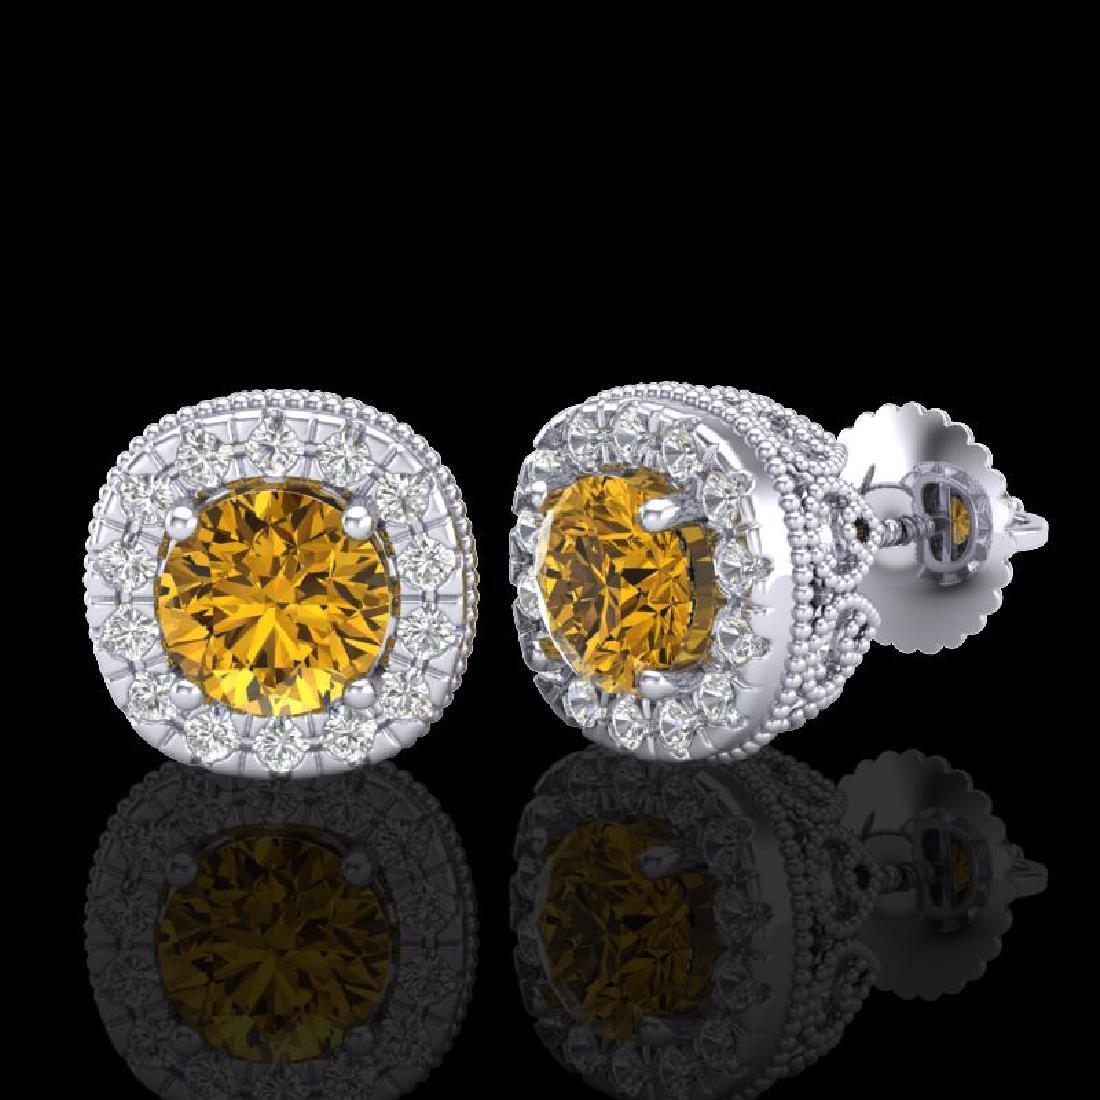 1.69 CTW Intense Fancy Yellow Diamond Art Deco Stud - 2